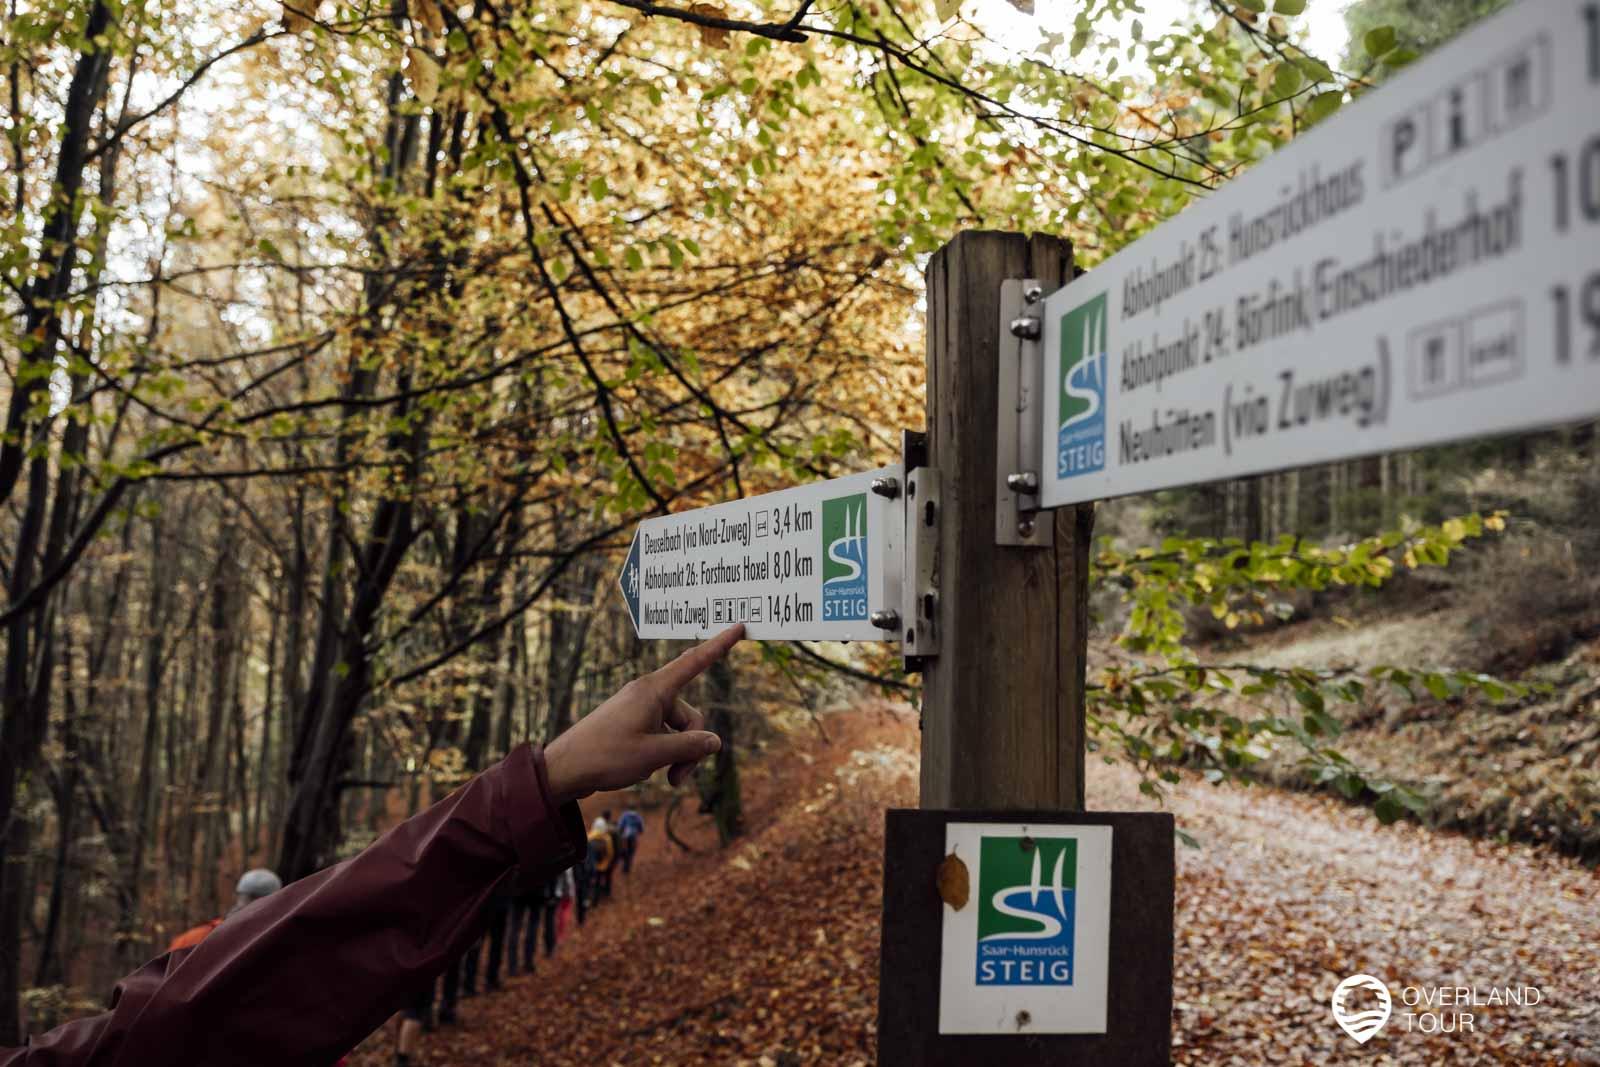 Herbst-Wandern auf dem Saar-Hunsrück-Steig